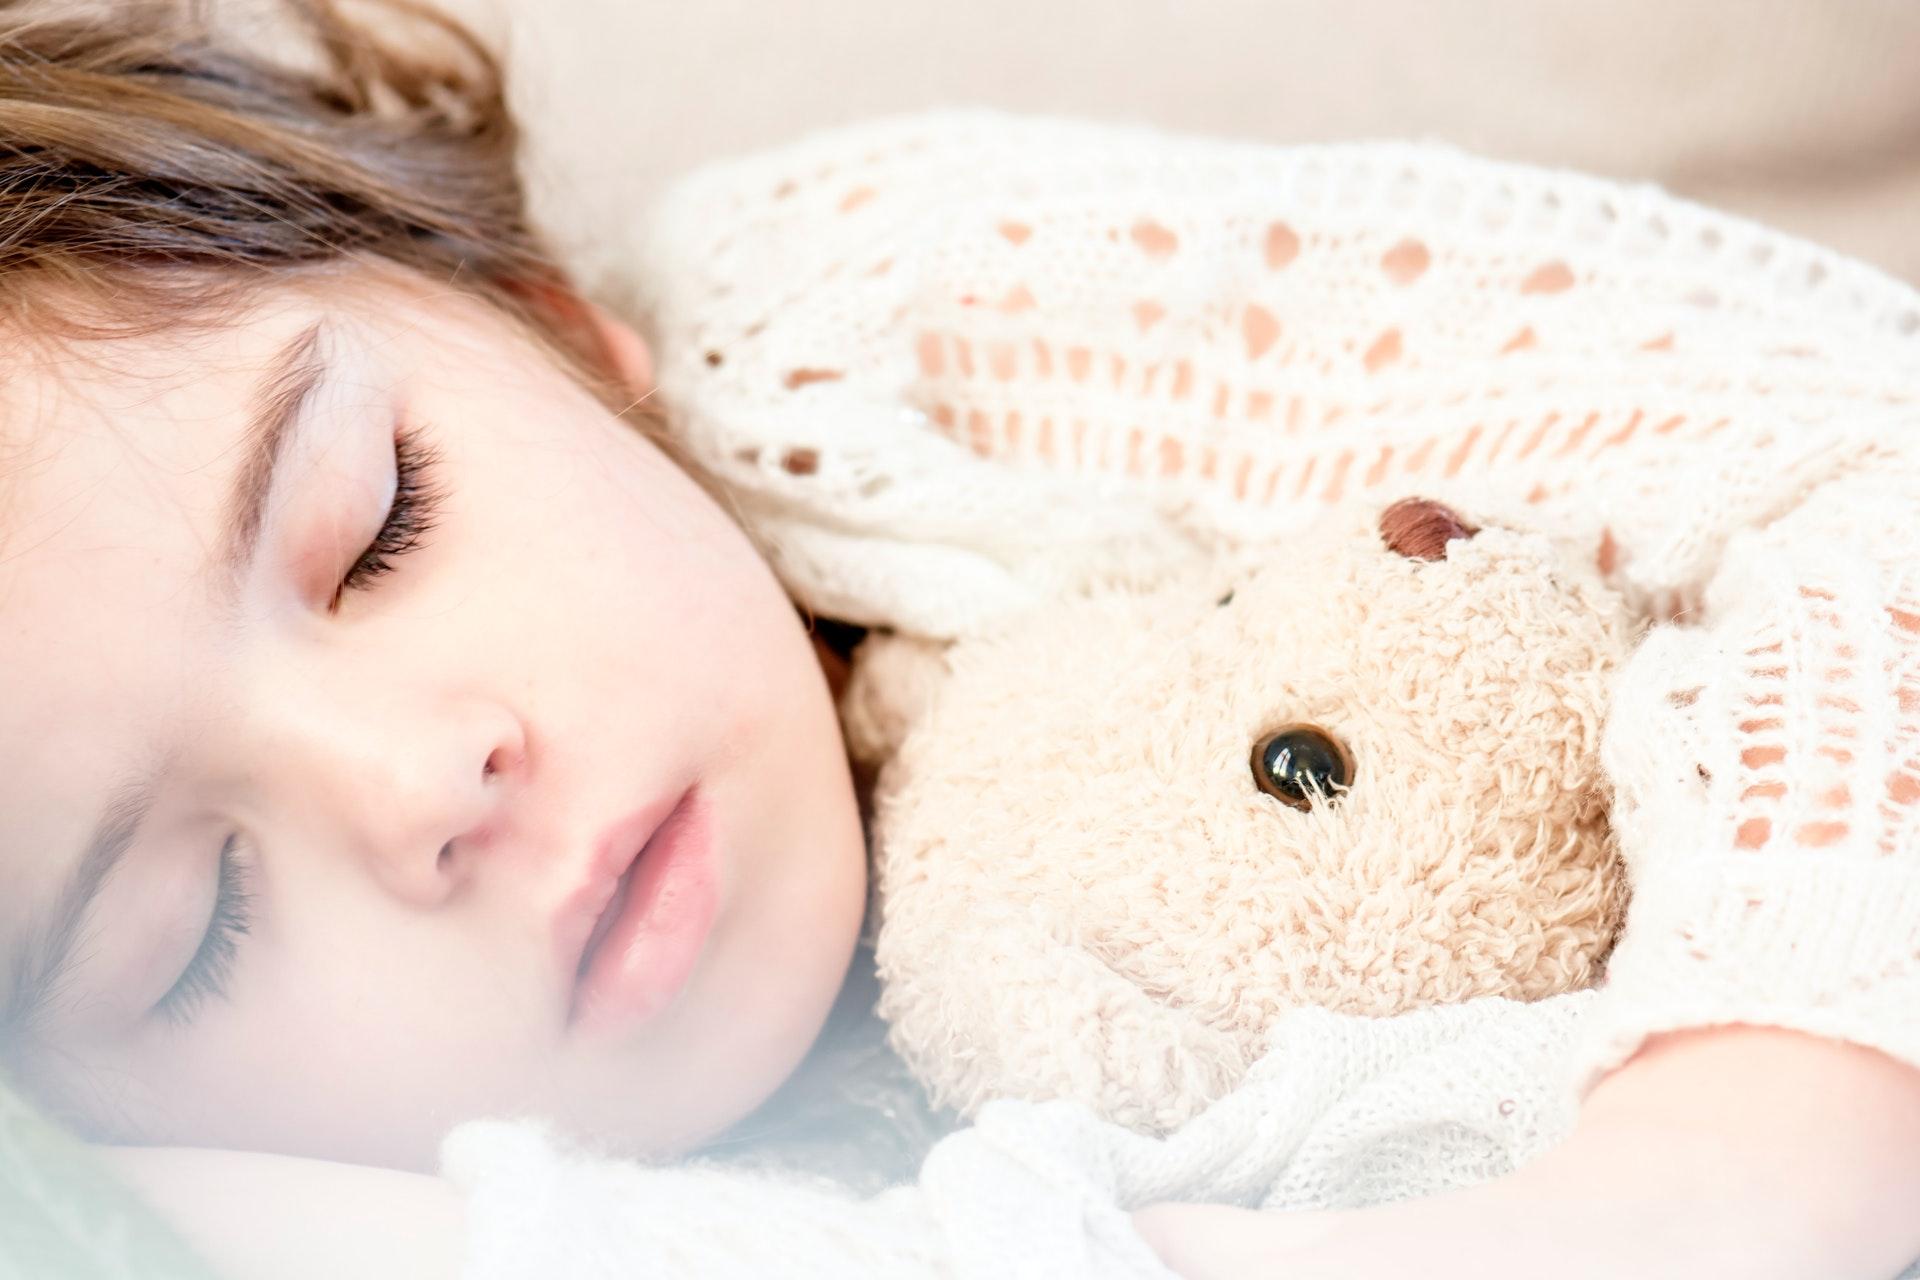 Helping Child Through sickness